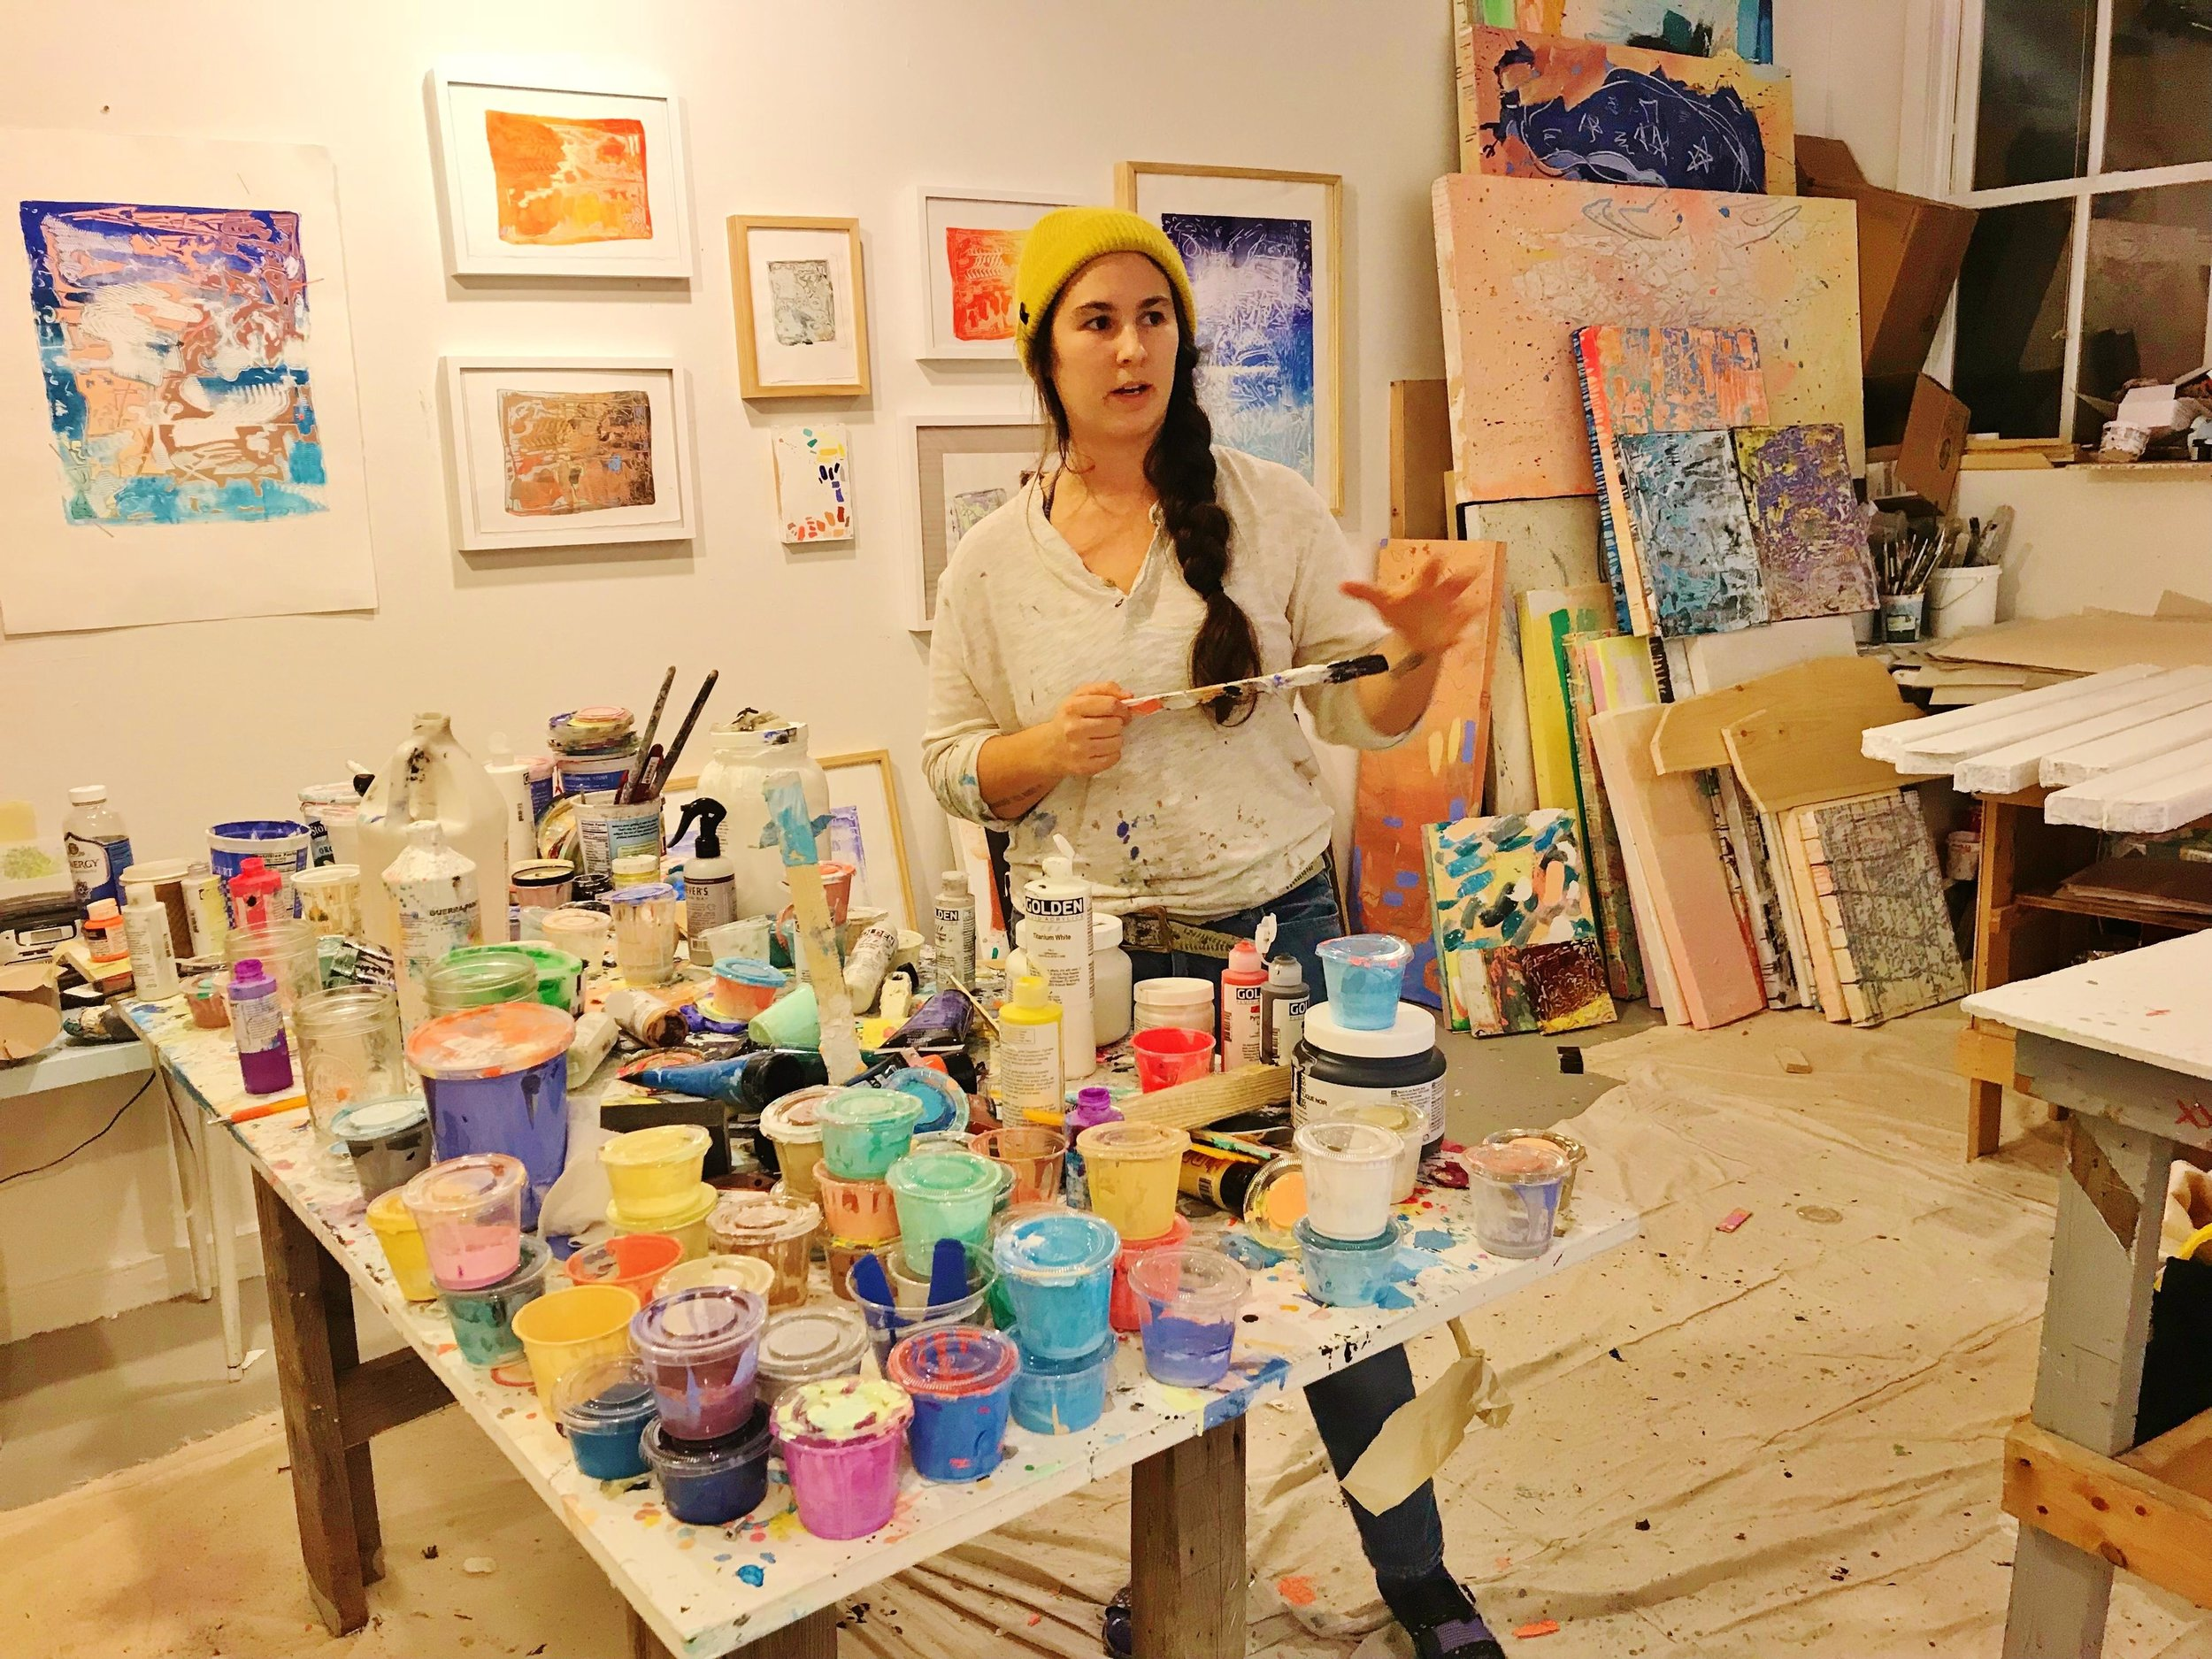 Jenna Pirello in her Fine Arts Work Center studio in Provincetown, MA 2018. Image courtesy of Ann Wood at  Wicked Local Truro.